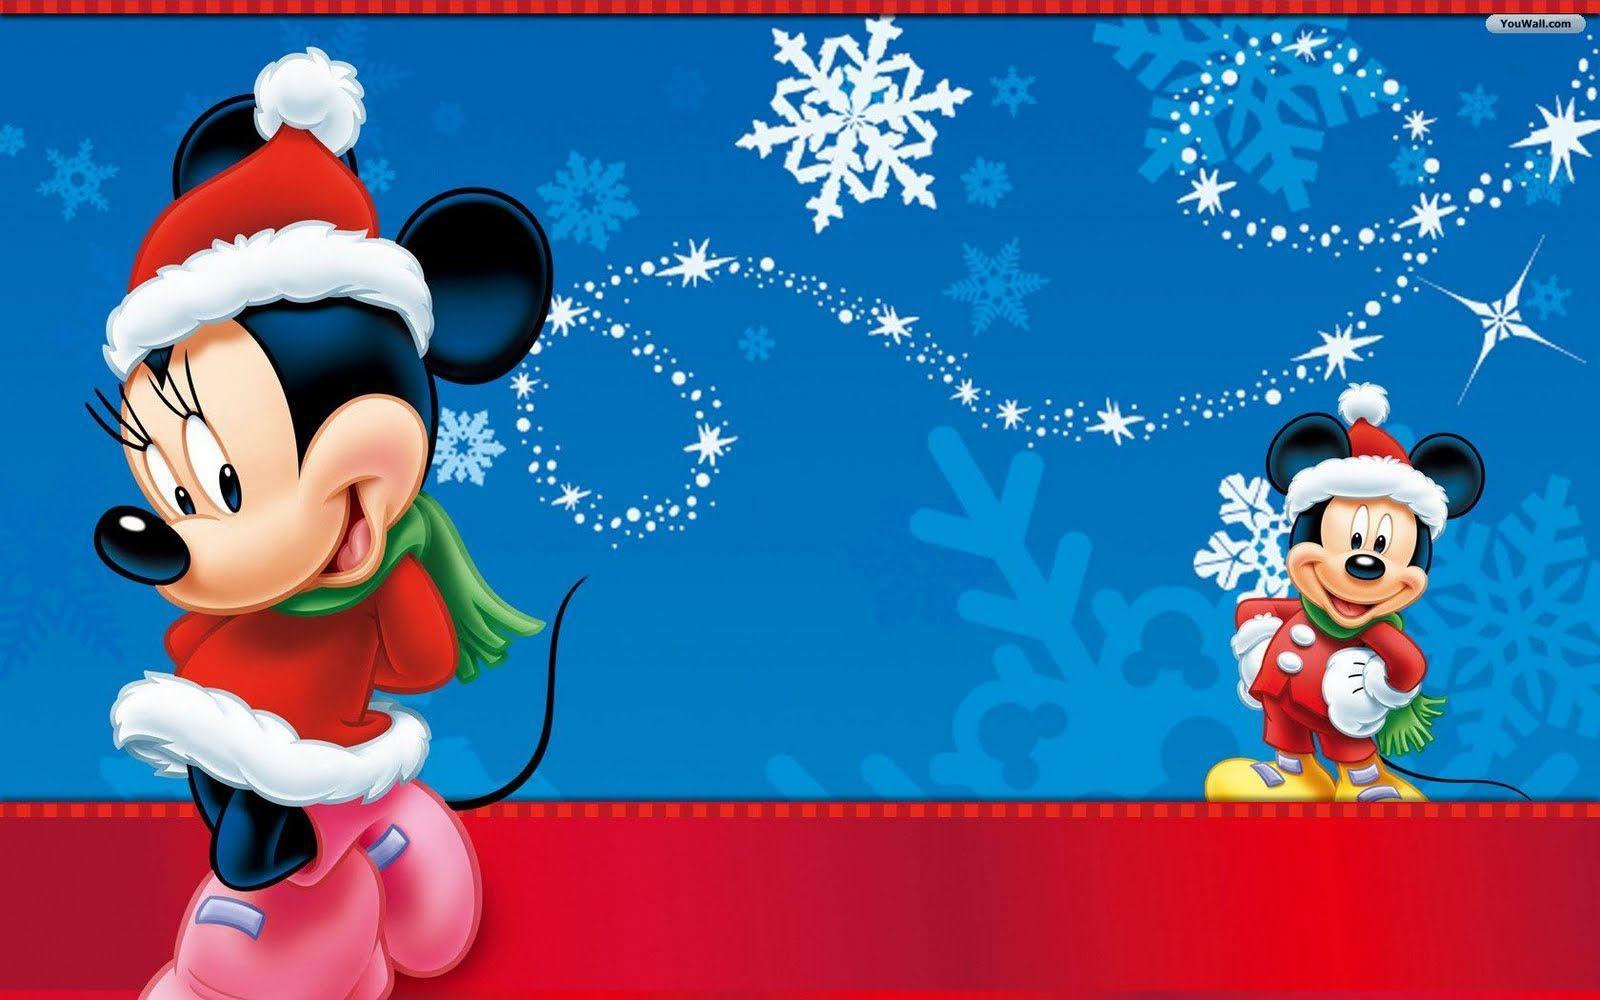 Disney Christmas Backgrounds Free